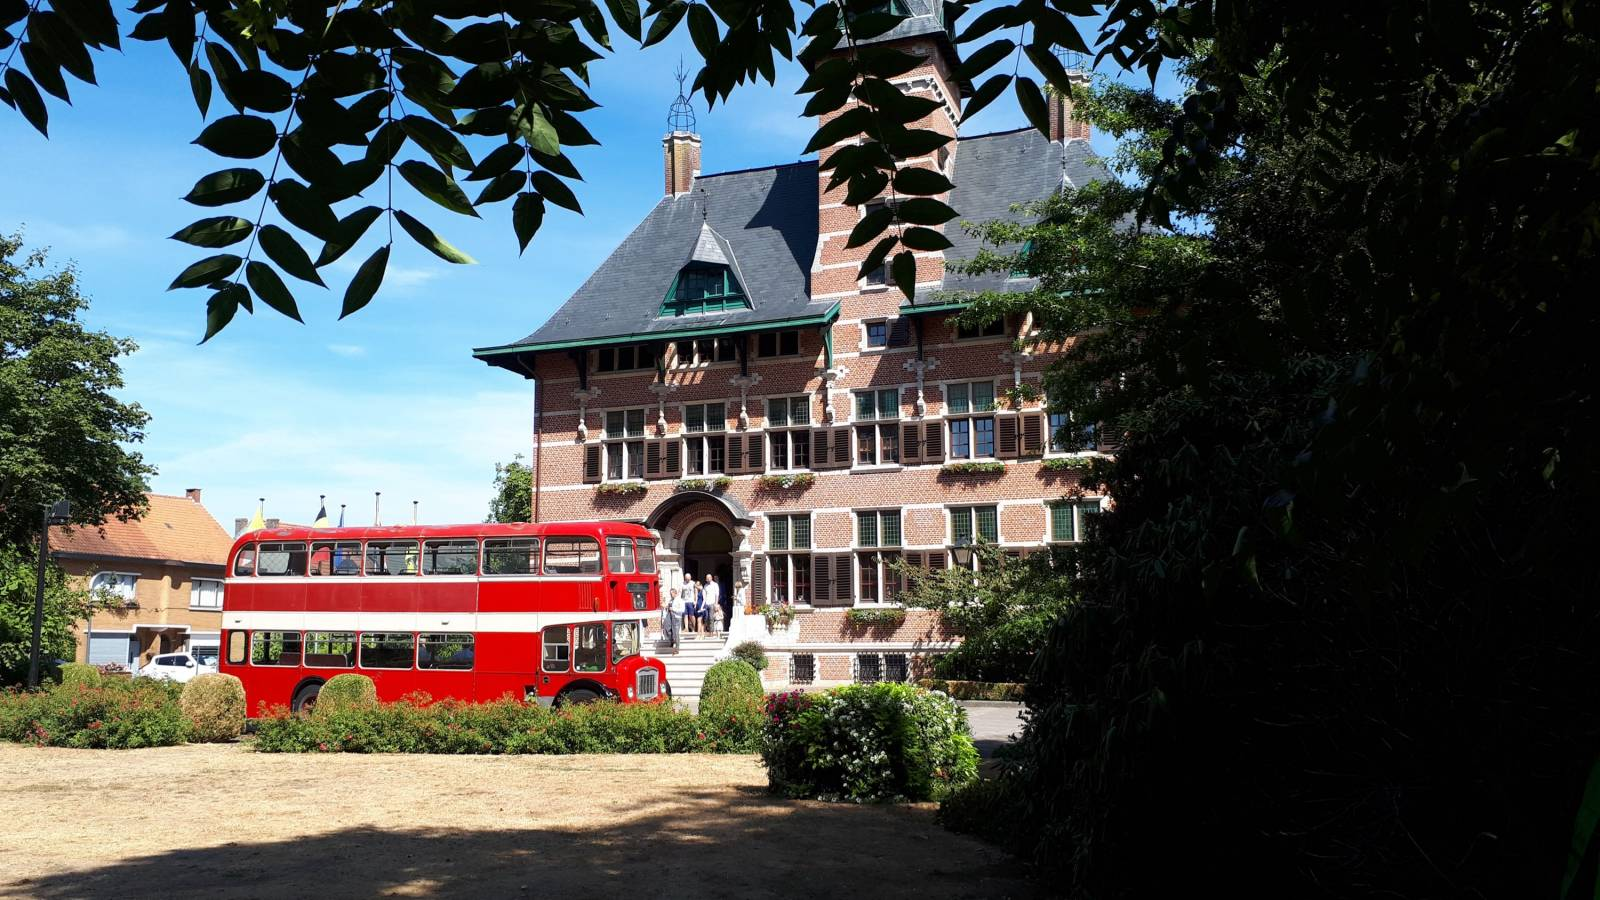 The London Ceremony Bus - Trouwvervoer - Ceremonievervoer - Bus - House of Weddings - 6